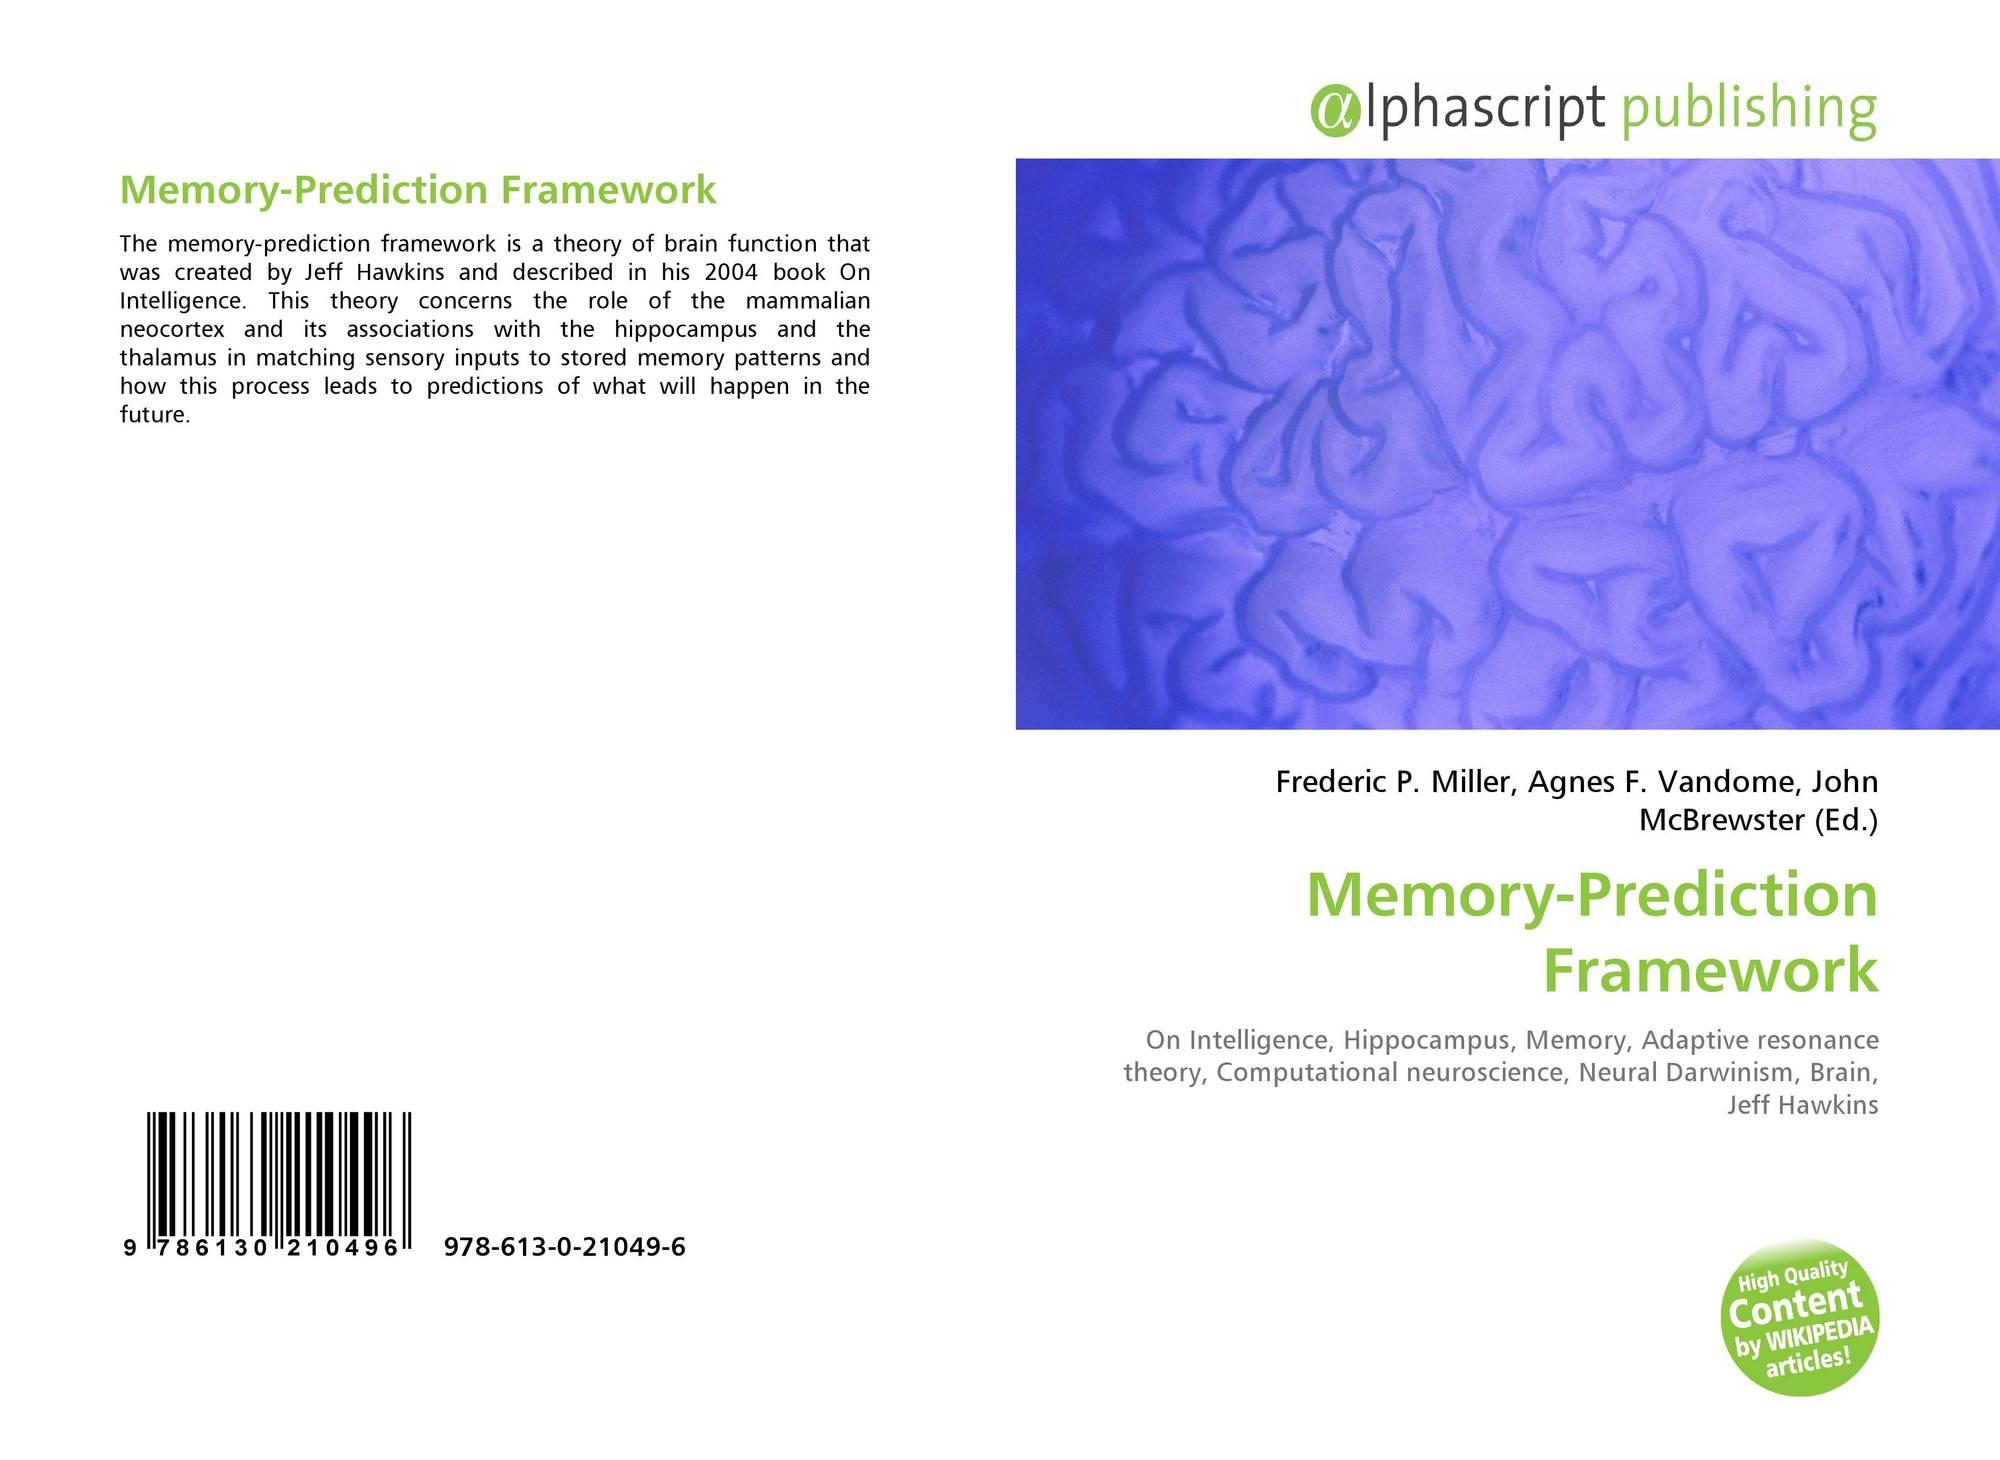 Memory-Prediction Framework, 978-613-0-21049-6, 6130210493